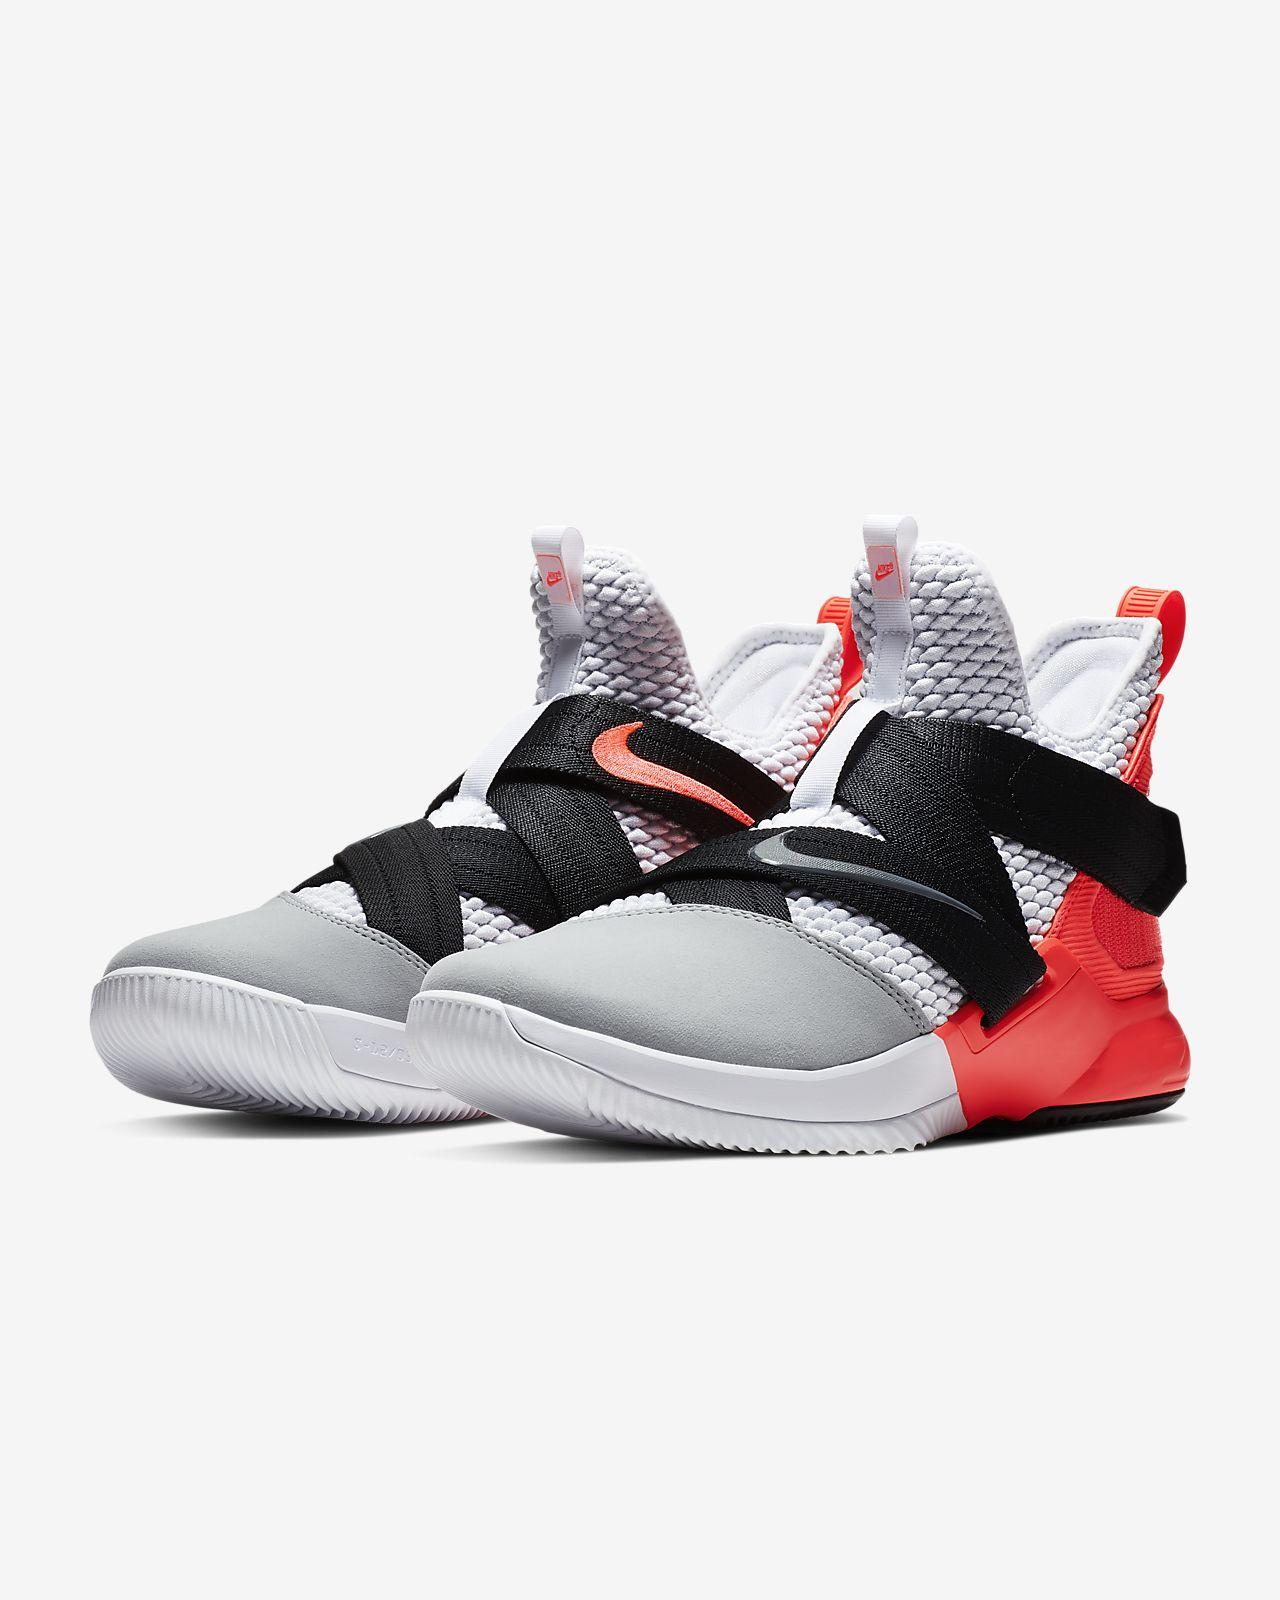 4ba3350544b39 LeBron Soldier 12 SFG Basketball Shoe. Nike.com CH